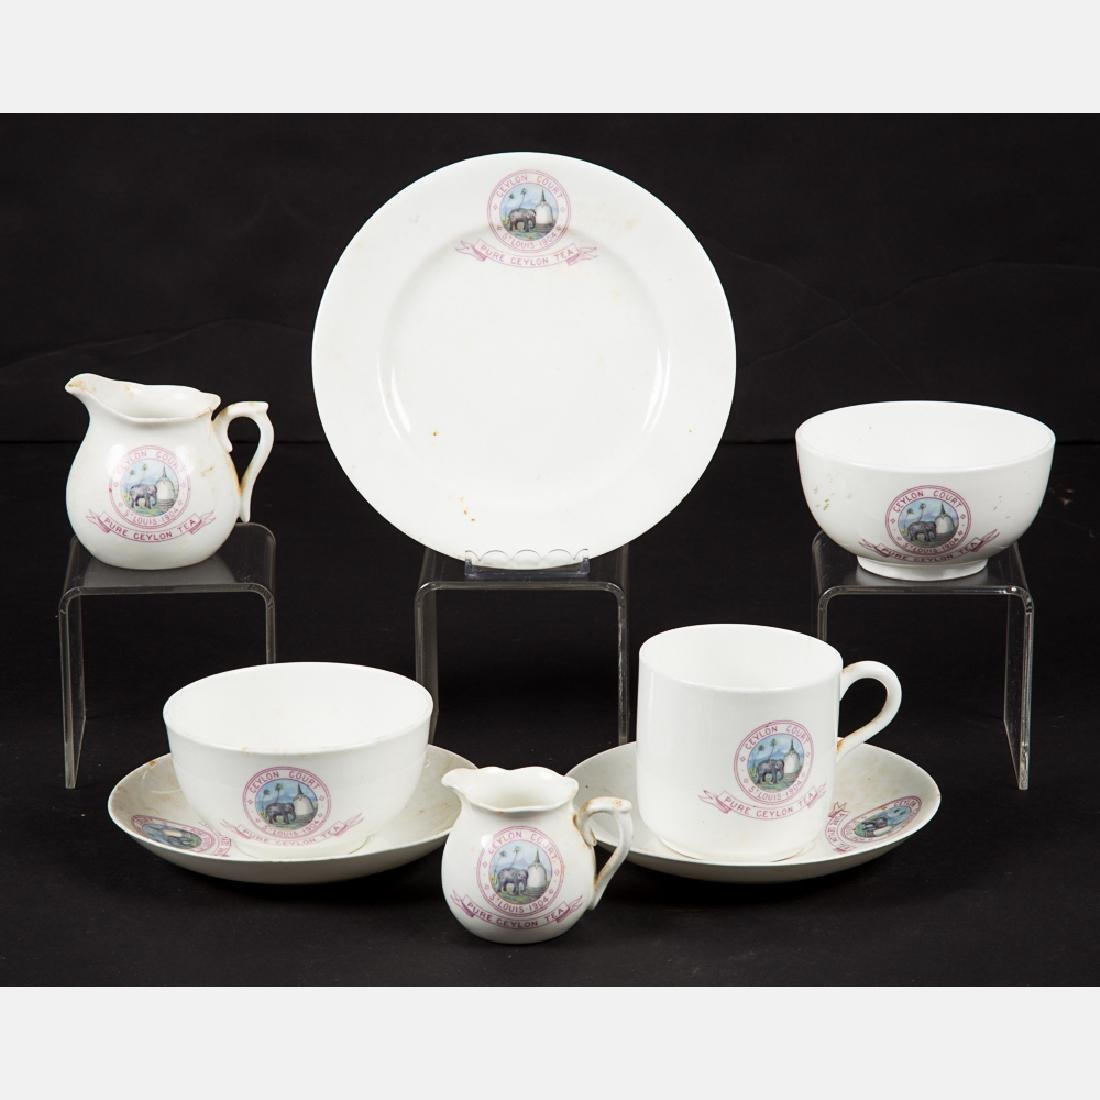 An Eight Piece Ceylon Court Porcelain Tea Set from the